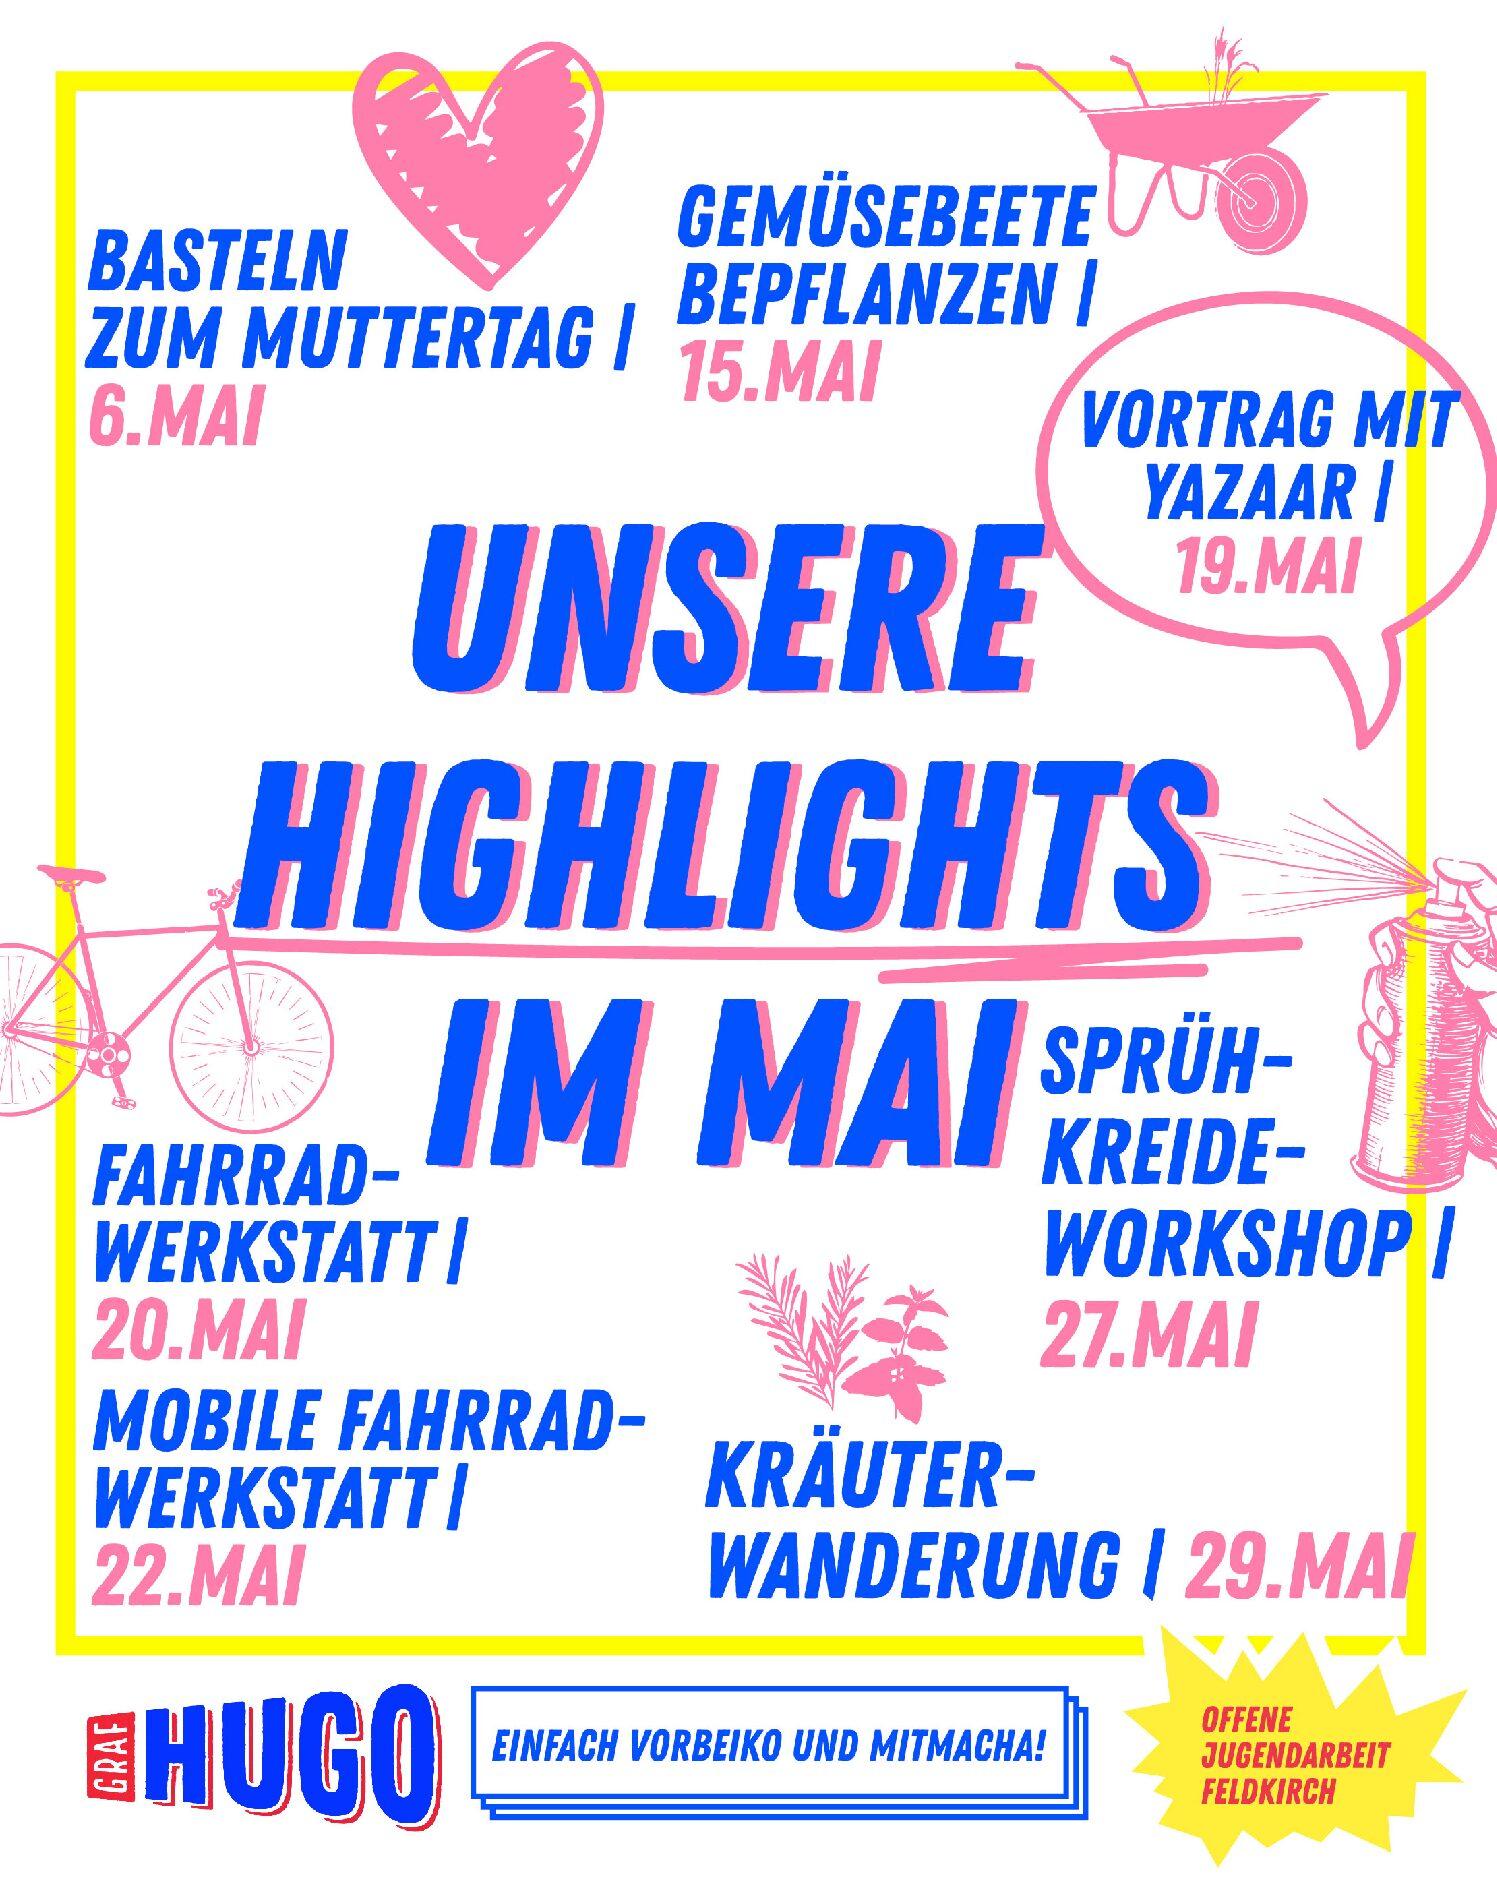 Unsere Highlights im Mai